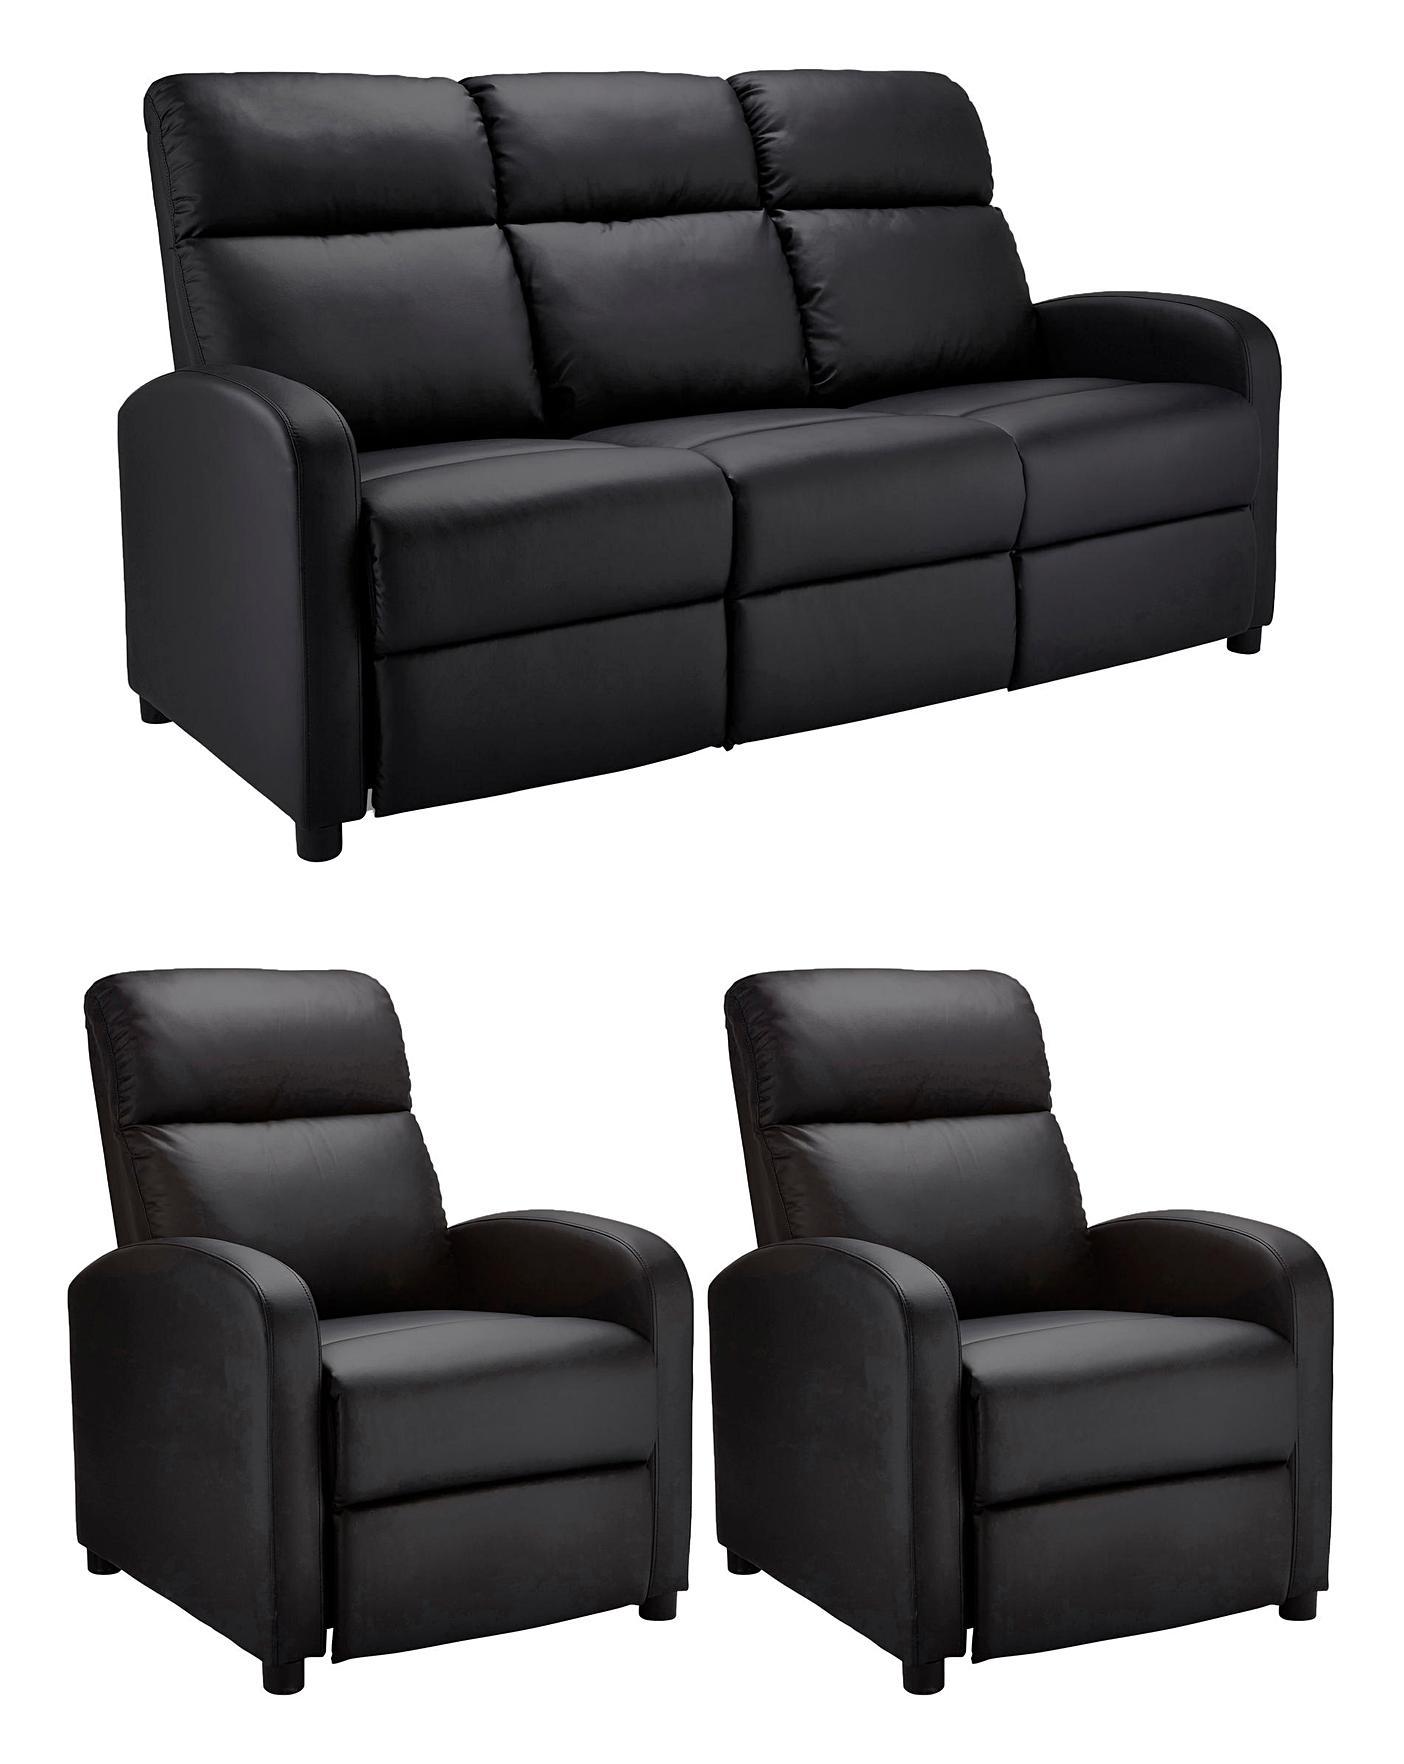 Hudson 3 Seater Sofa Plus 2 Chairs J